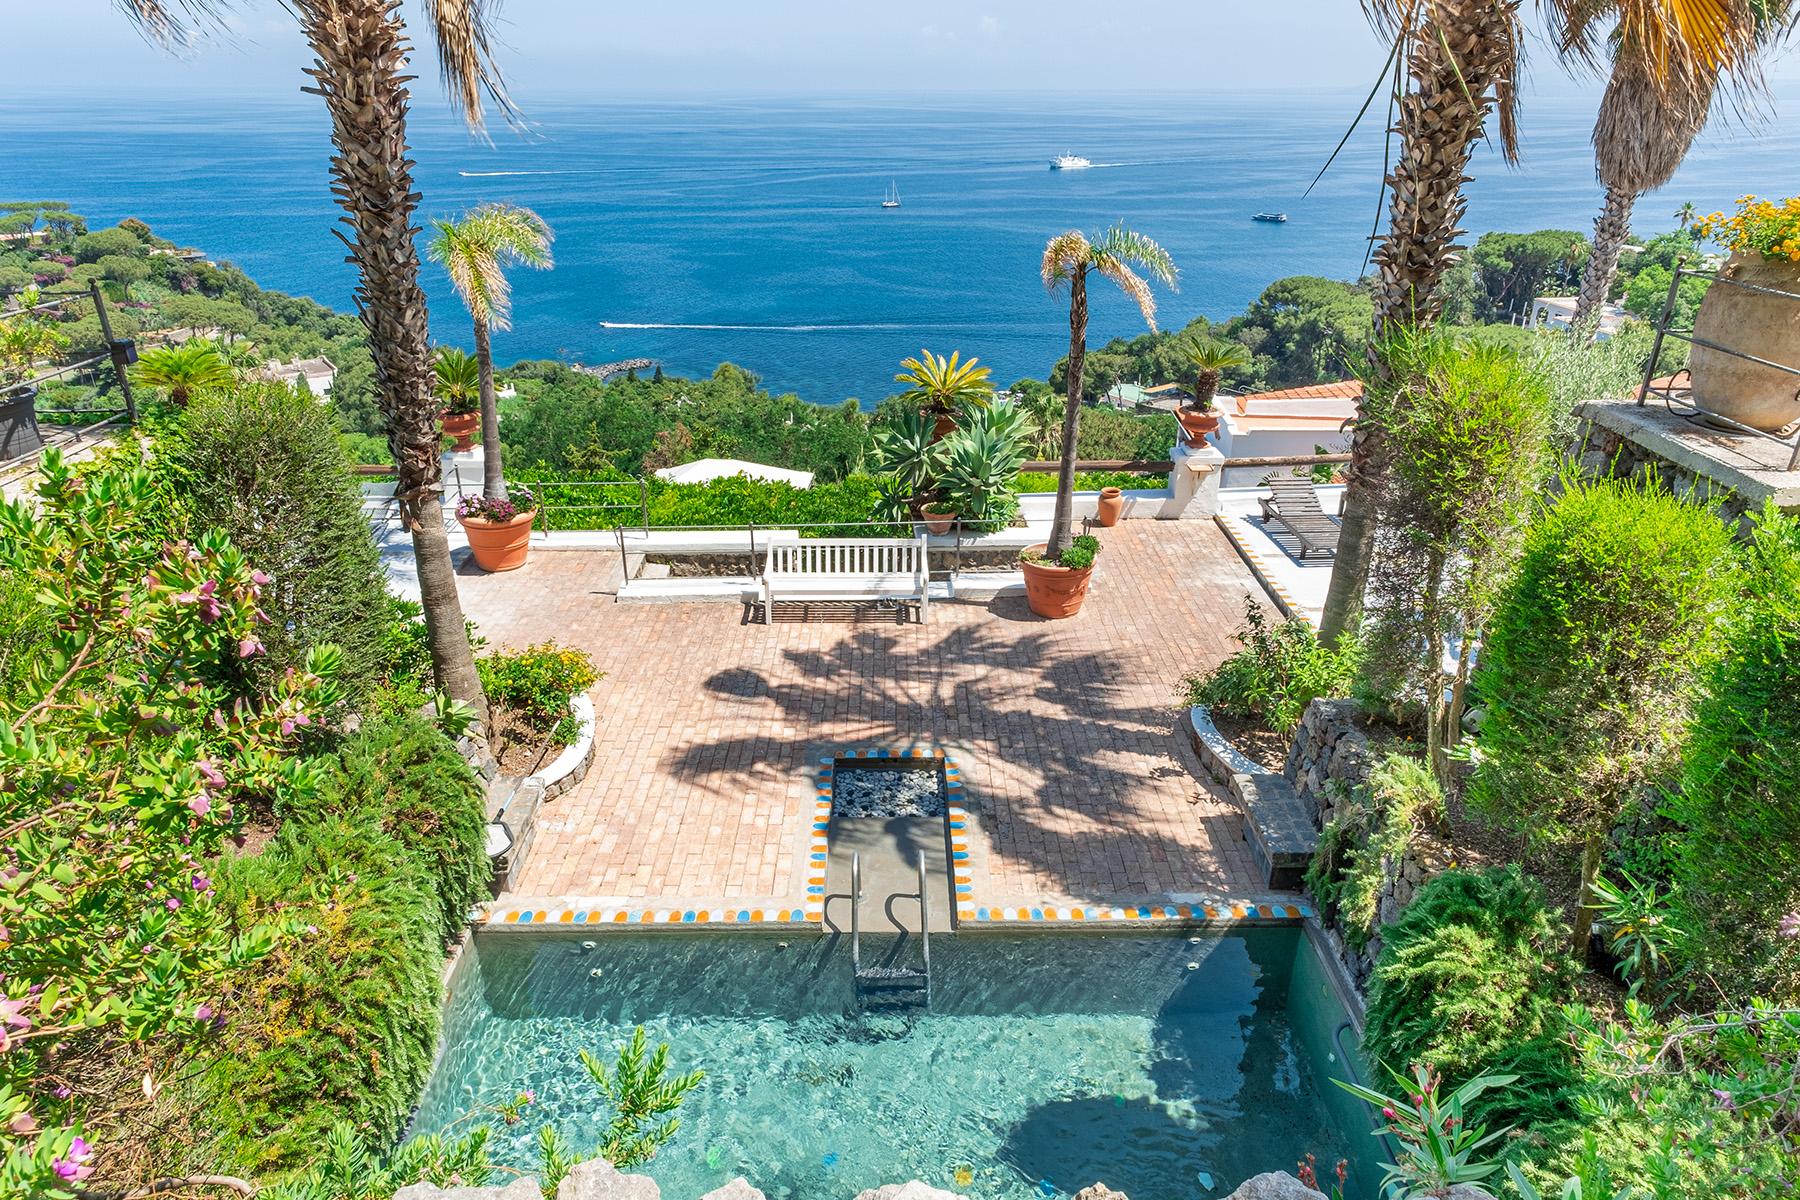 Villa in Vendita a Ischia: 5 locali, 500 mq - Foto 3